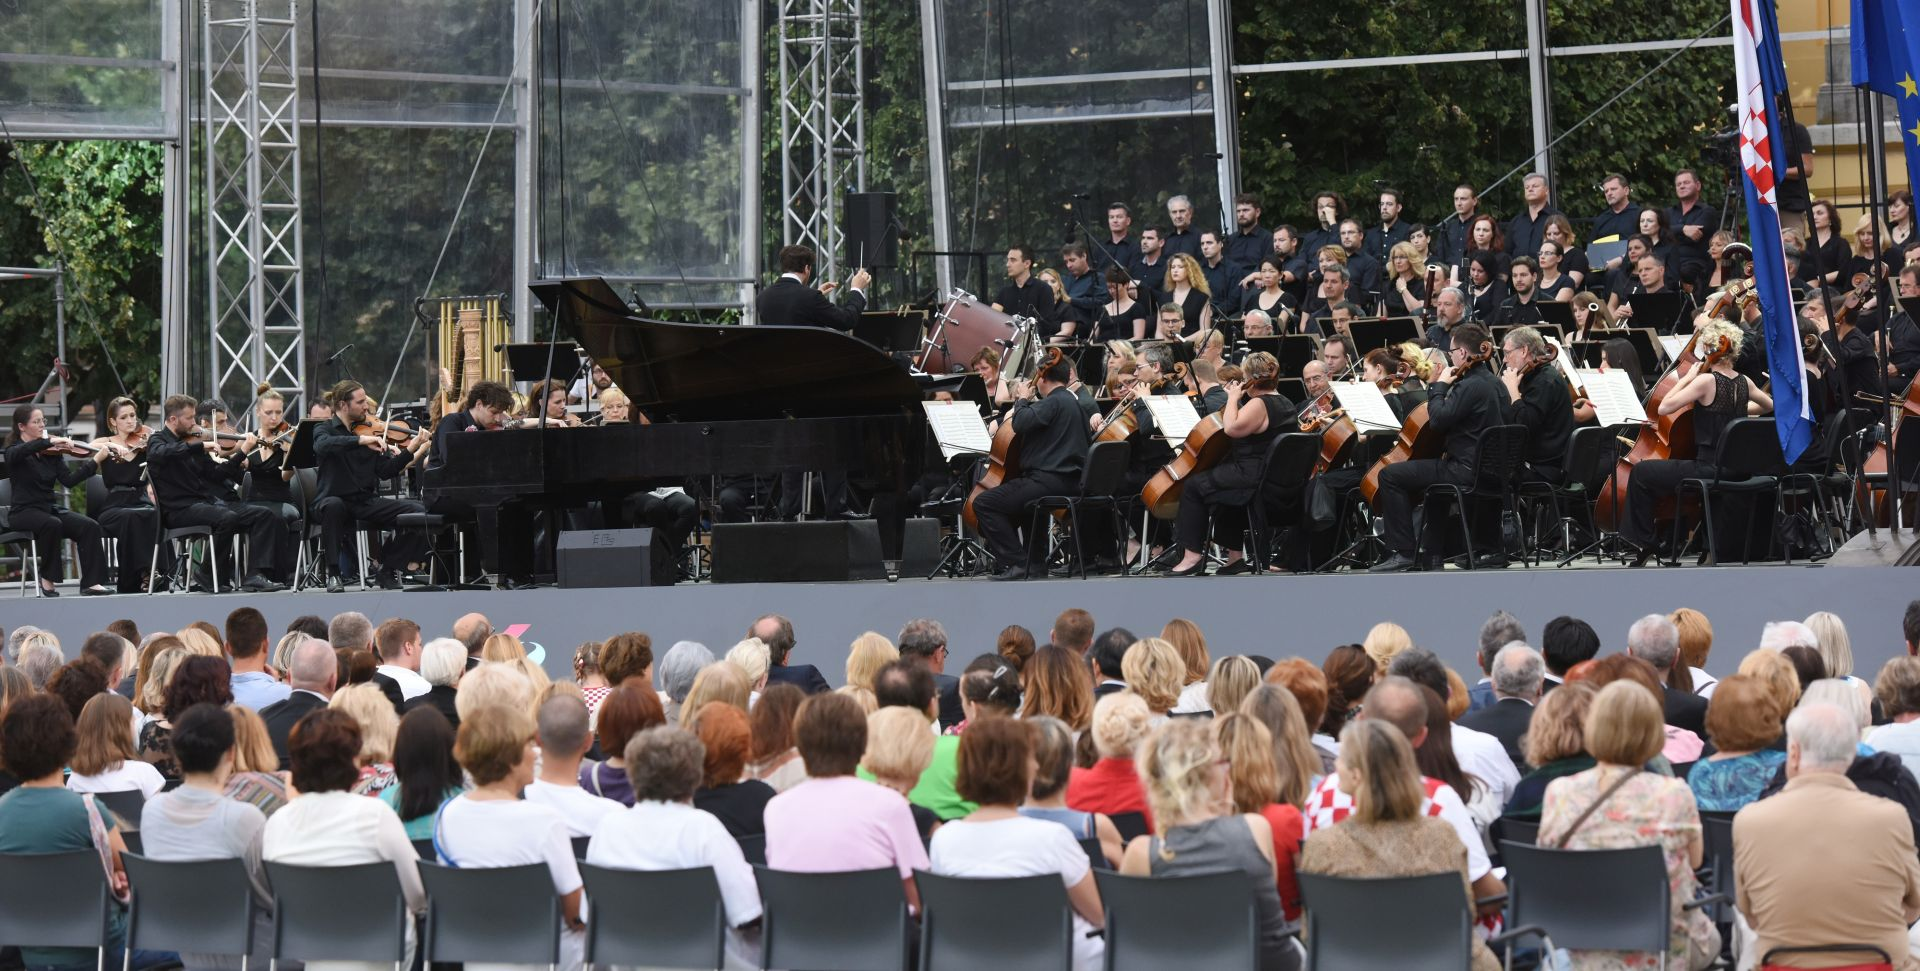 Svečani koncert u povodu Dana državnosti Republike Hrvatske